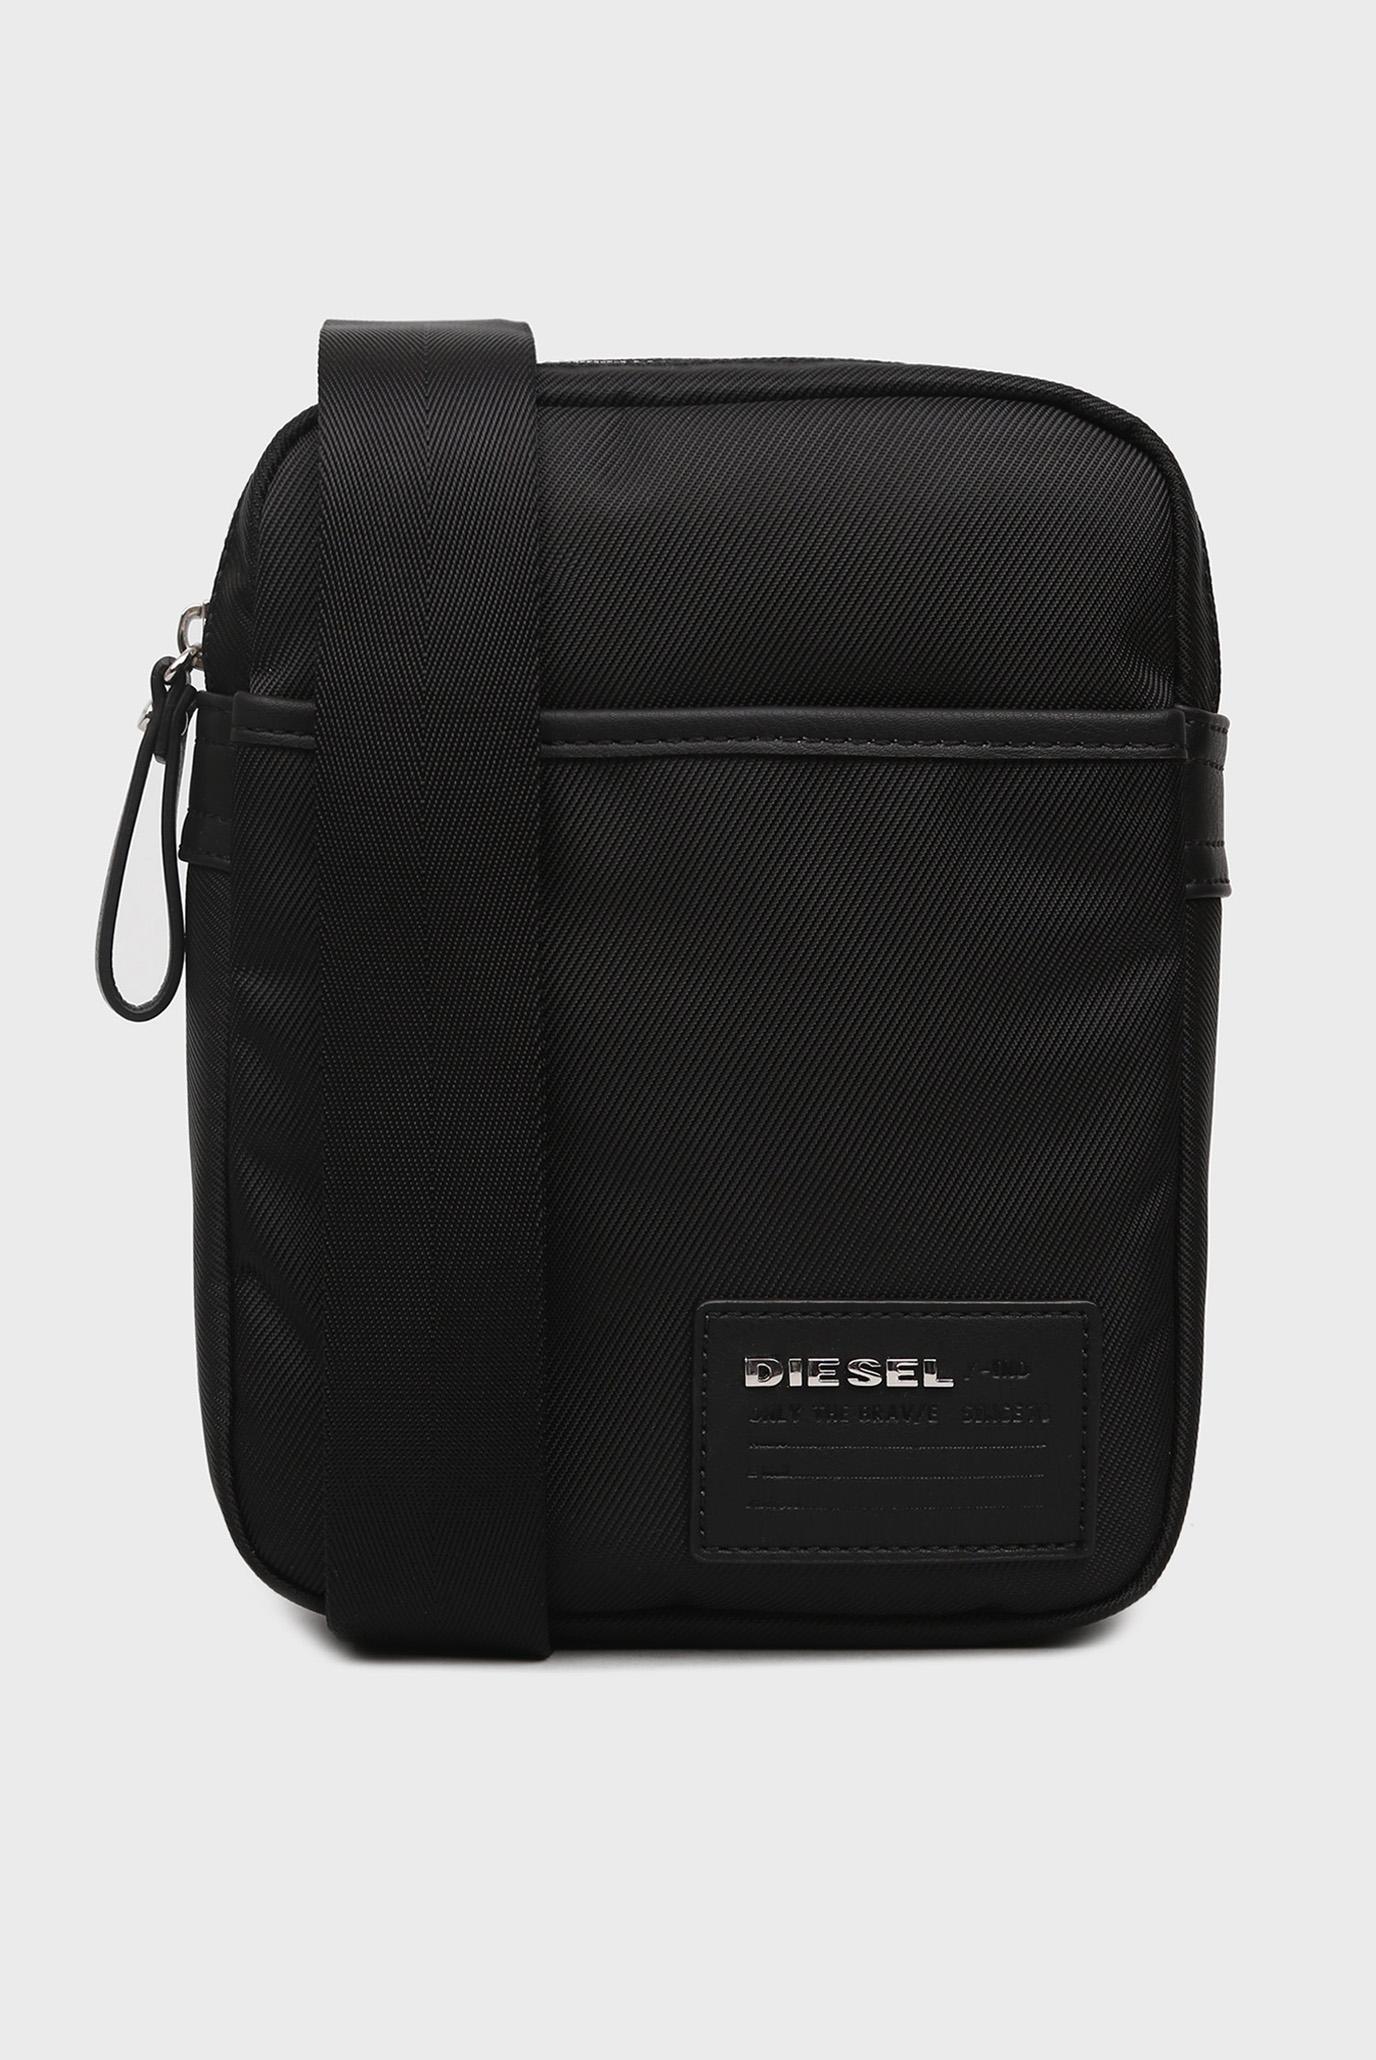 fcf7b4e20c66 Купить Мужская текстильная сумка через плечо Diesel Diesel X03005 ...